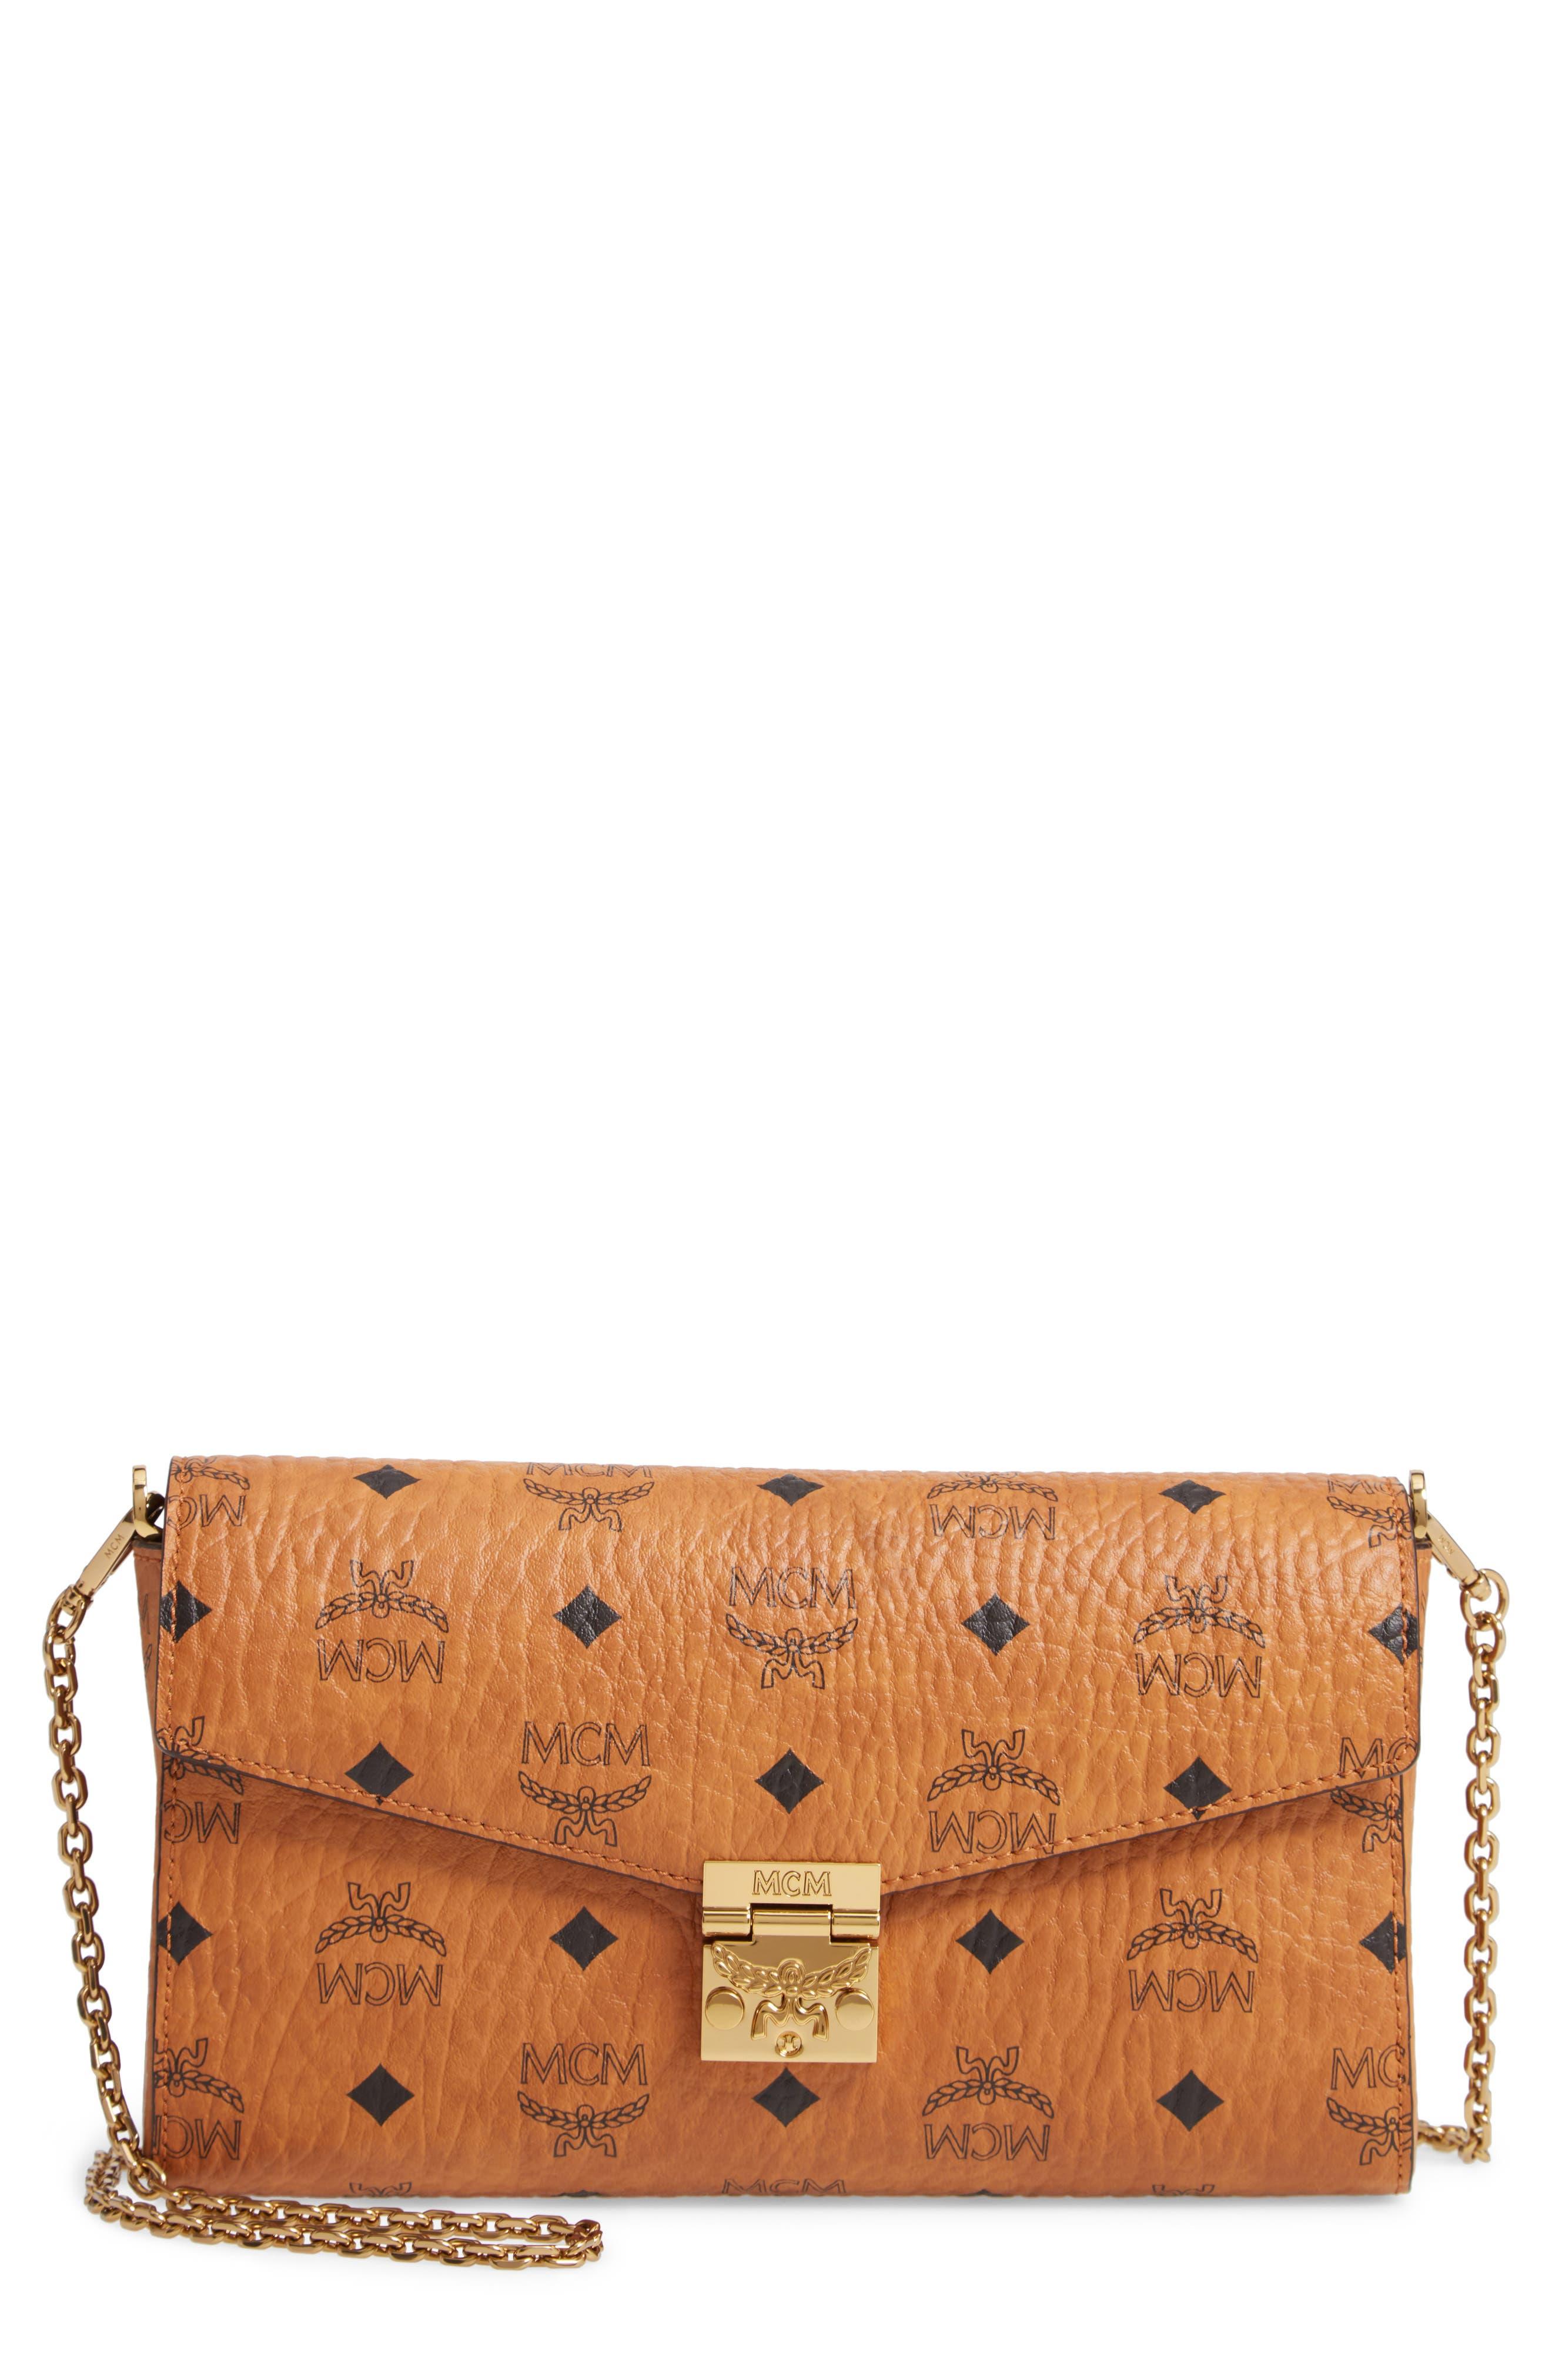 Millie Monogrammed Leather Crossbody Bag, Main, color, COGNAC BROWN